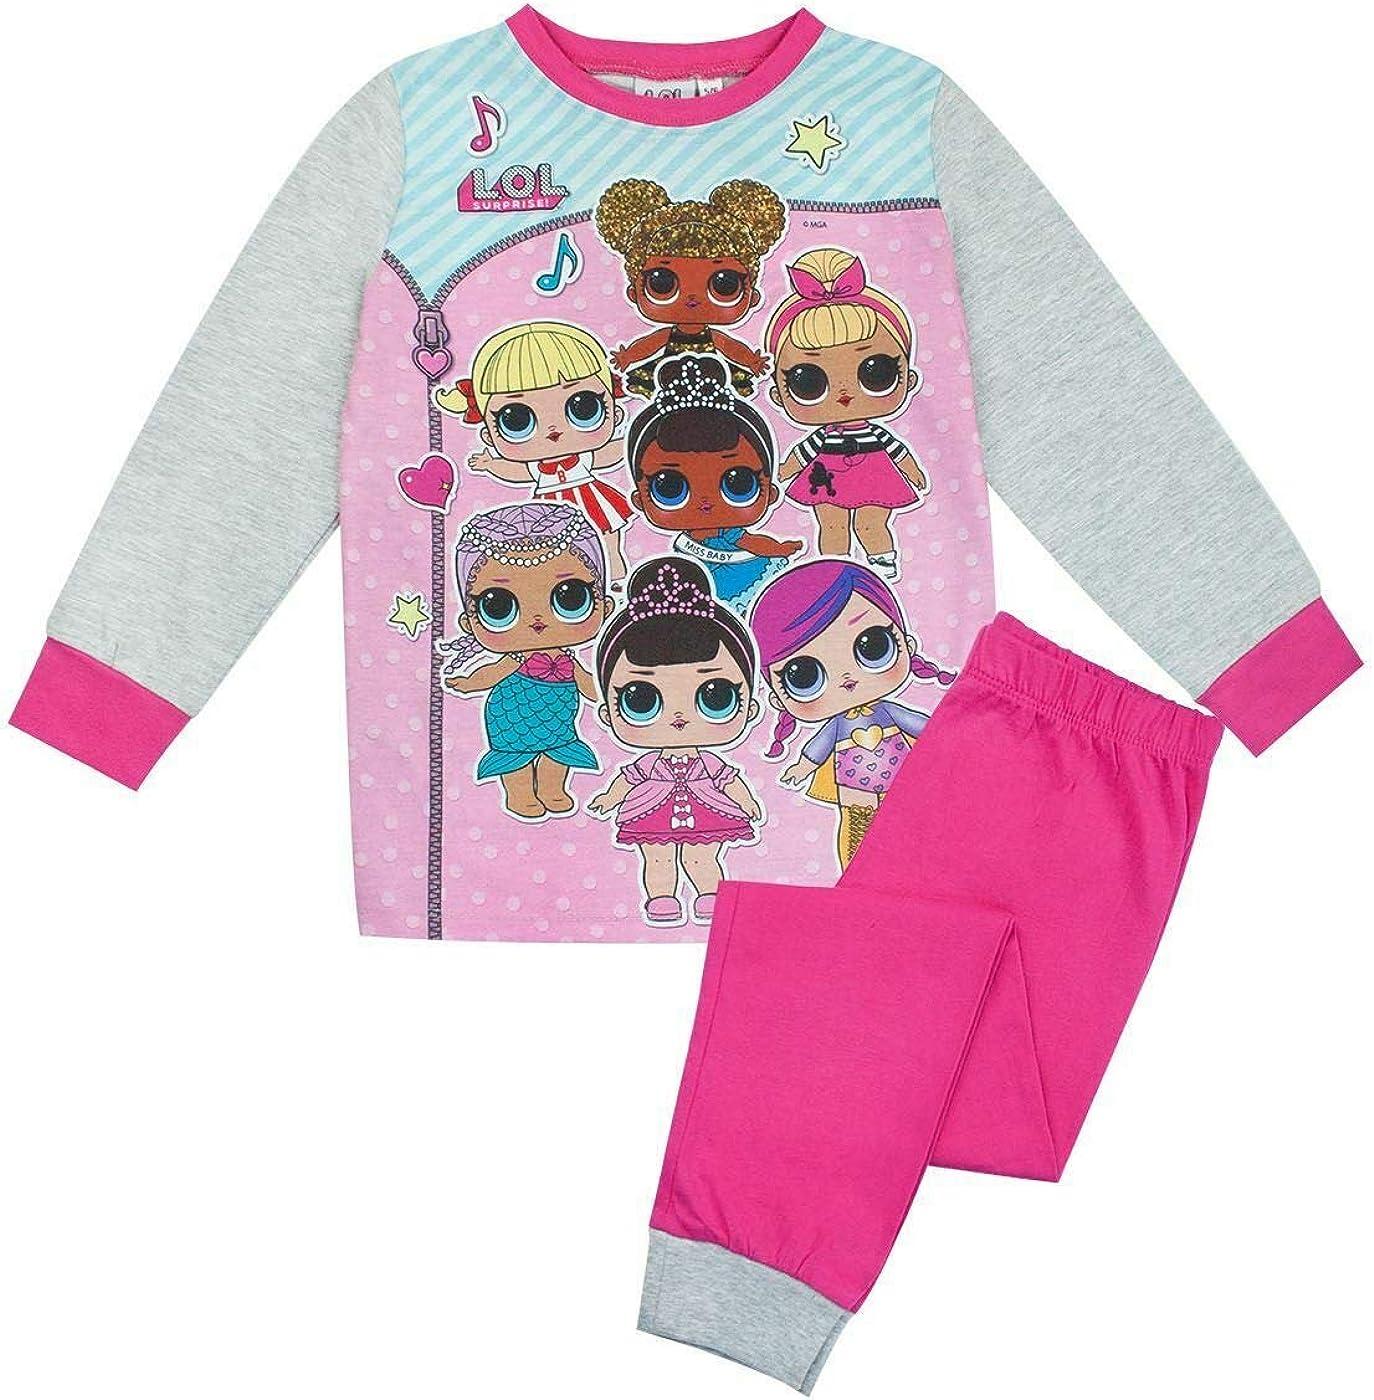 L.O.L. Surprise! Pijama para niñas Dolls